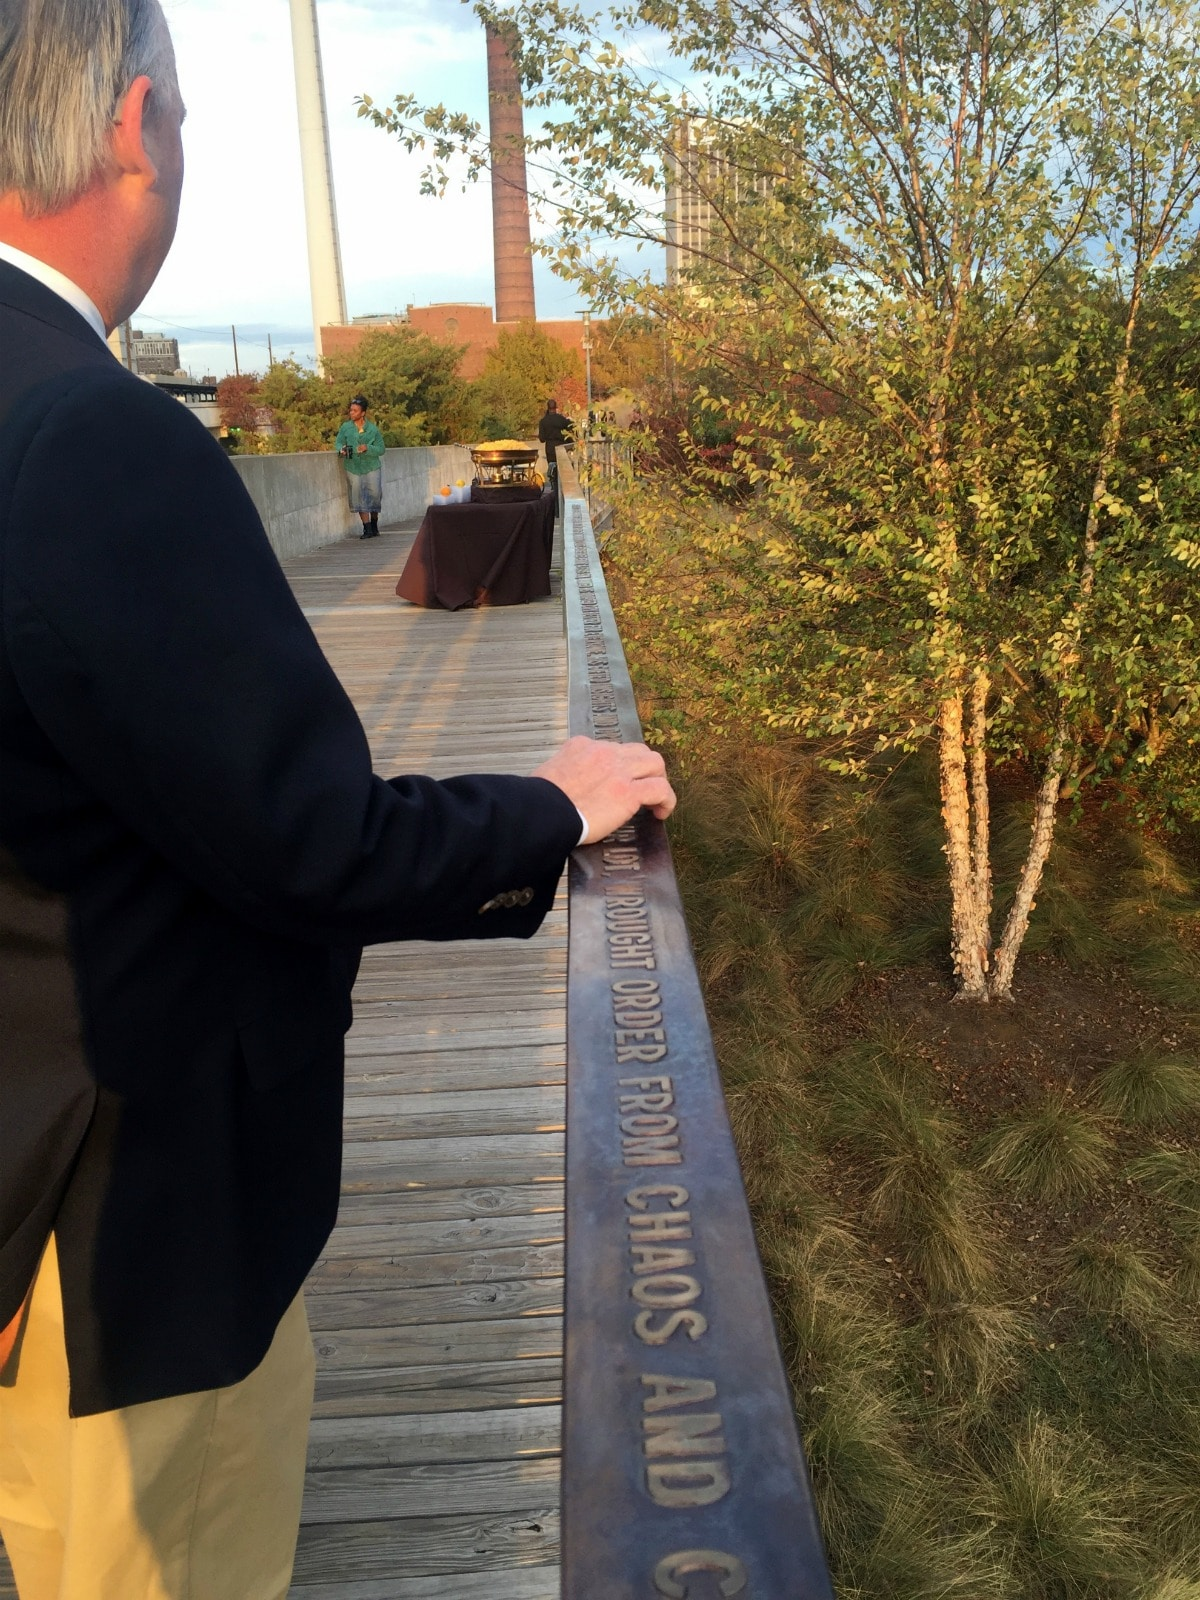 Giles with sculptor Brad Morton's railing at Railroad Park